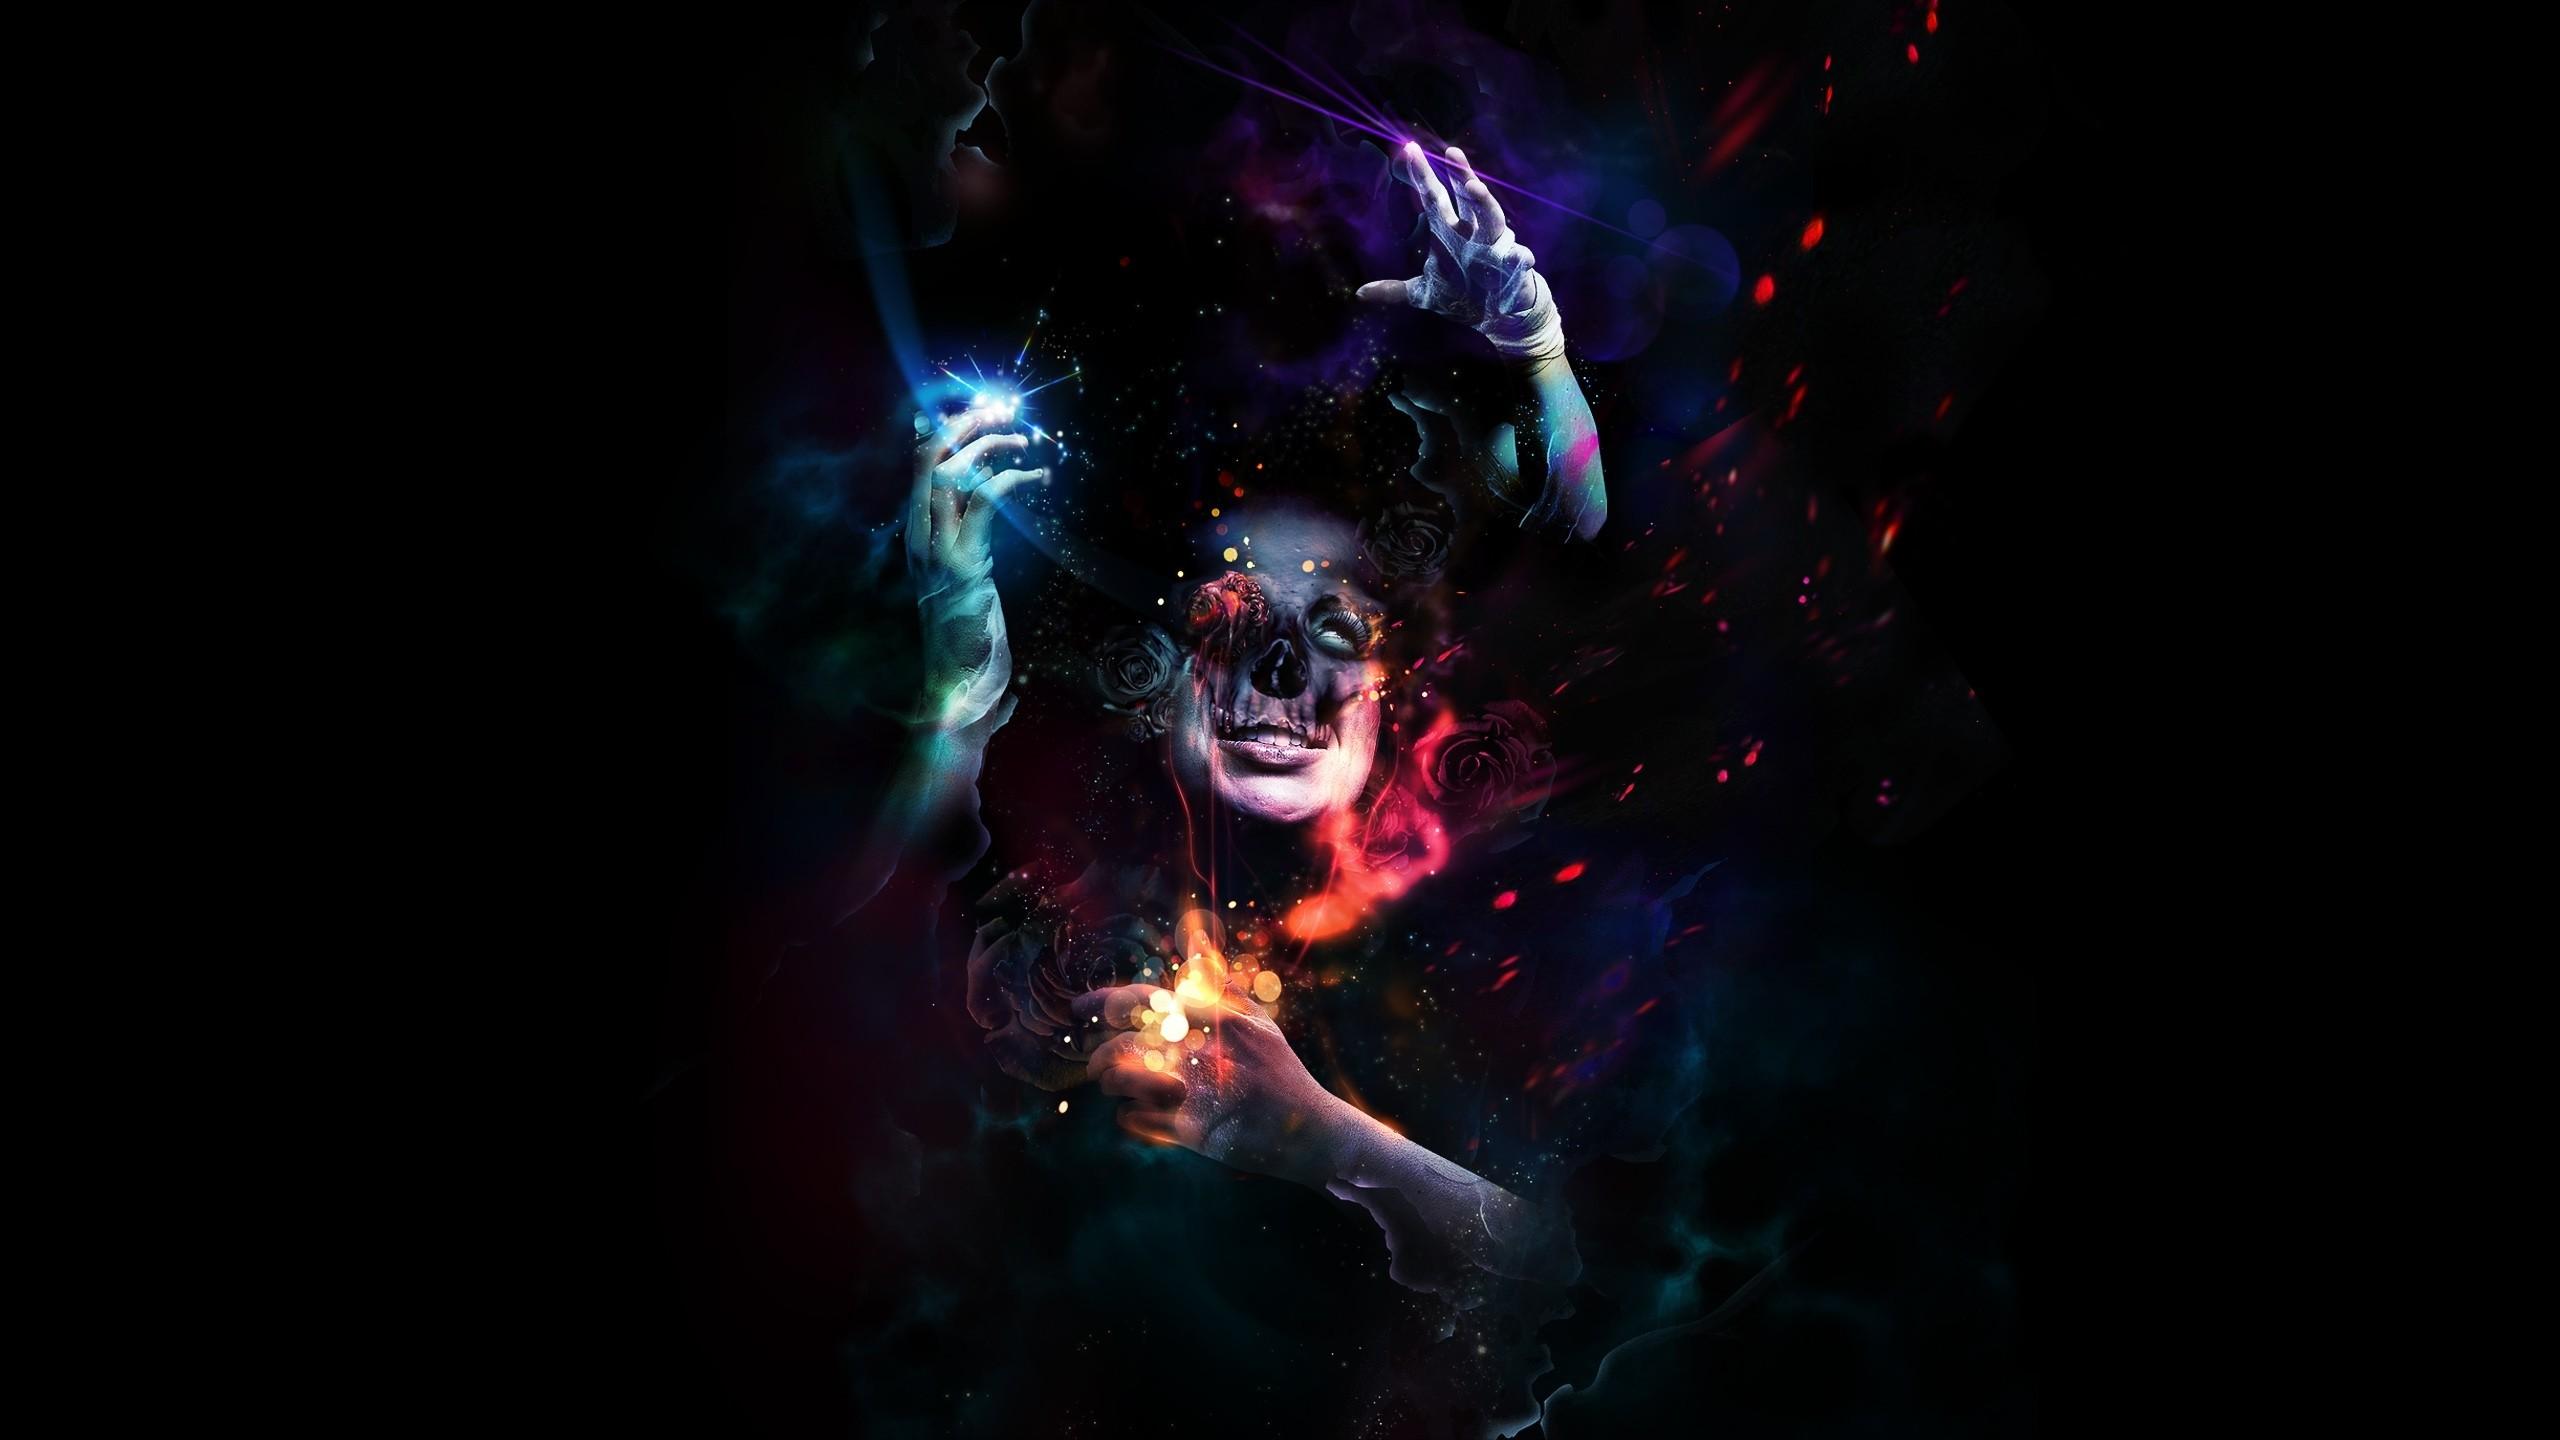 Wallpaper Man, Hands, Horror, Colorful, Dark, Skull, Dressings HD, Picture,  Image